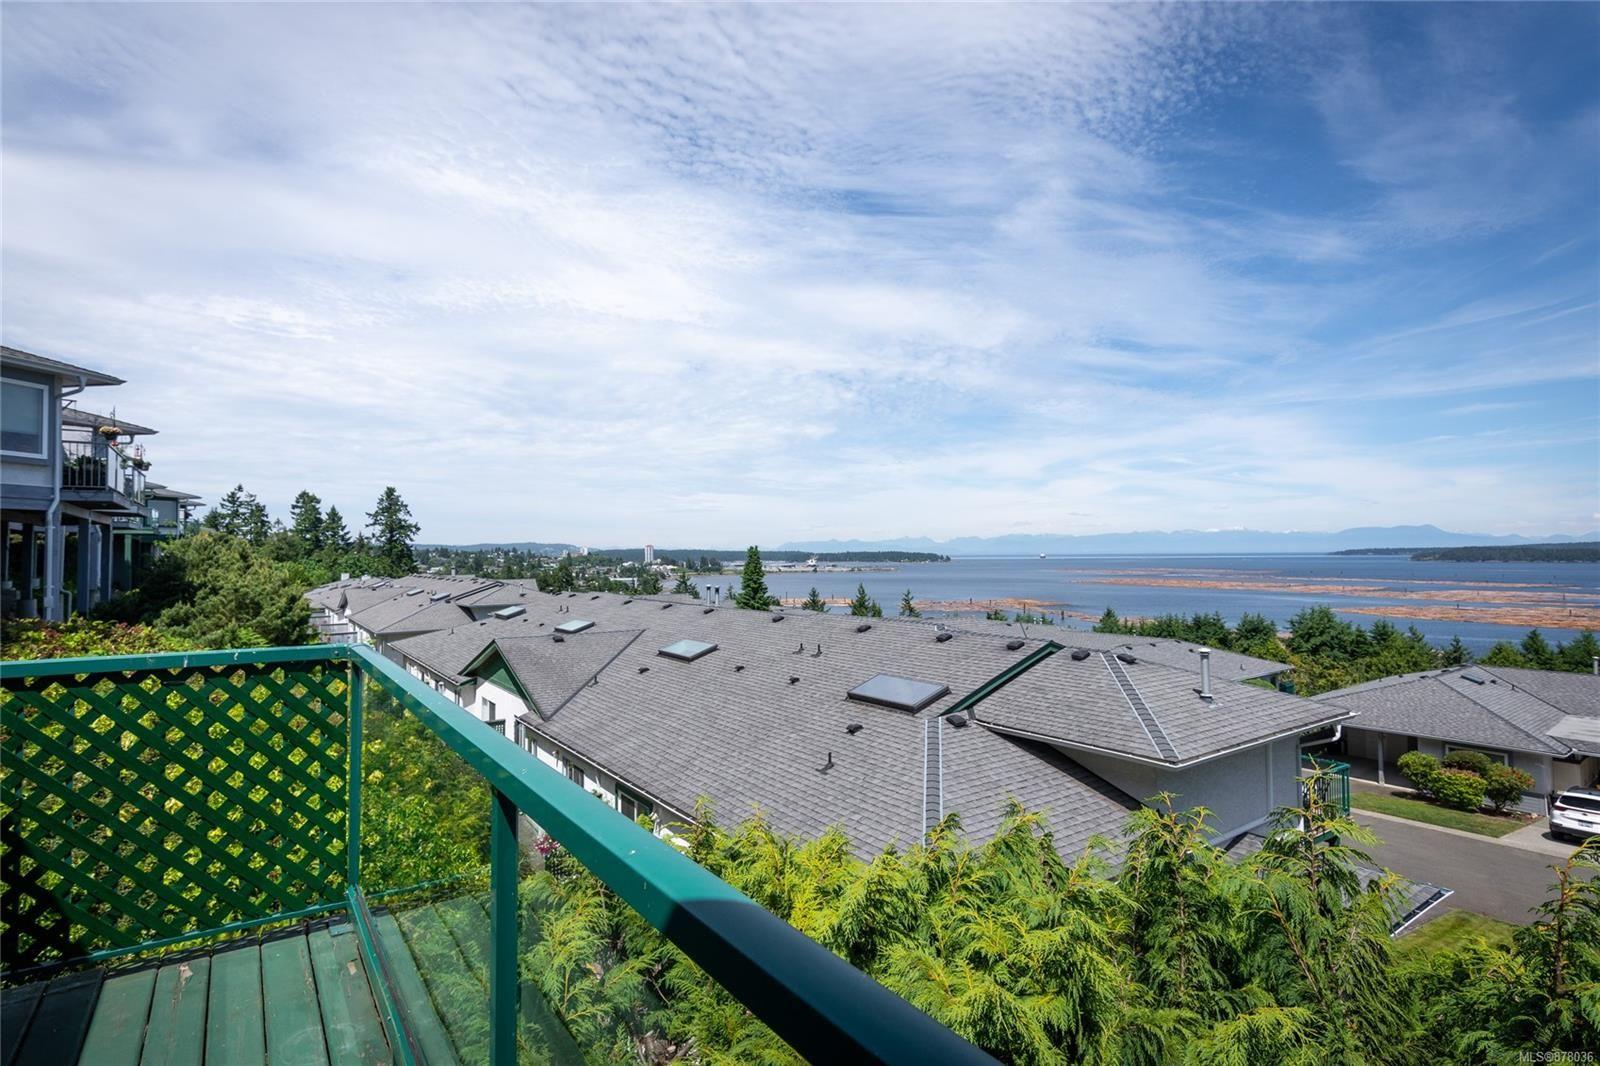 Main Photo: 1008 N Highview Terr in : Na South Nanaimo Row/Townhouse for sale (Nanaimo)  : MLS®# 878036